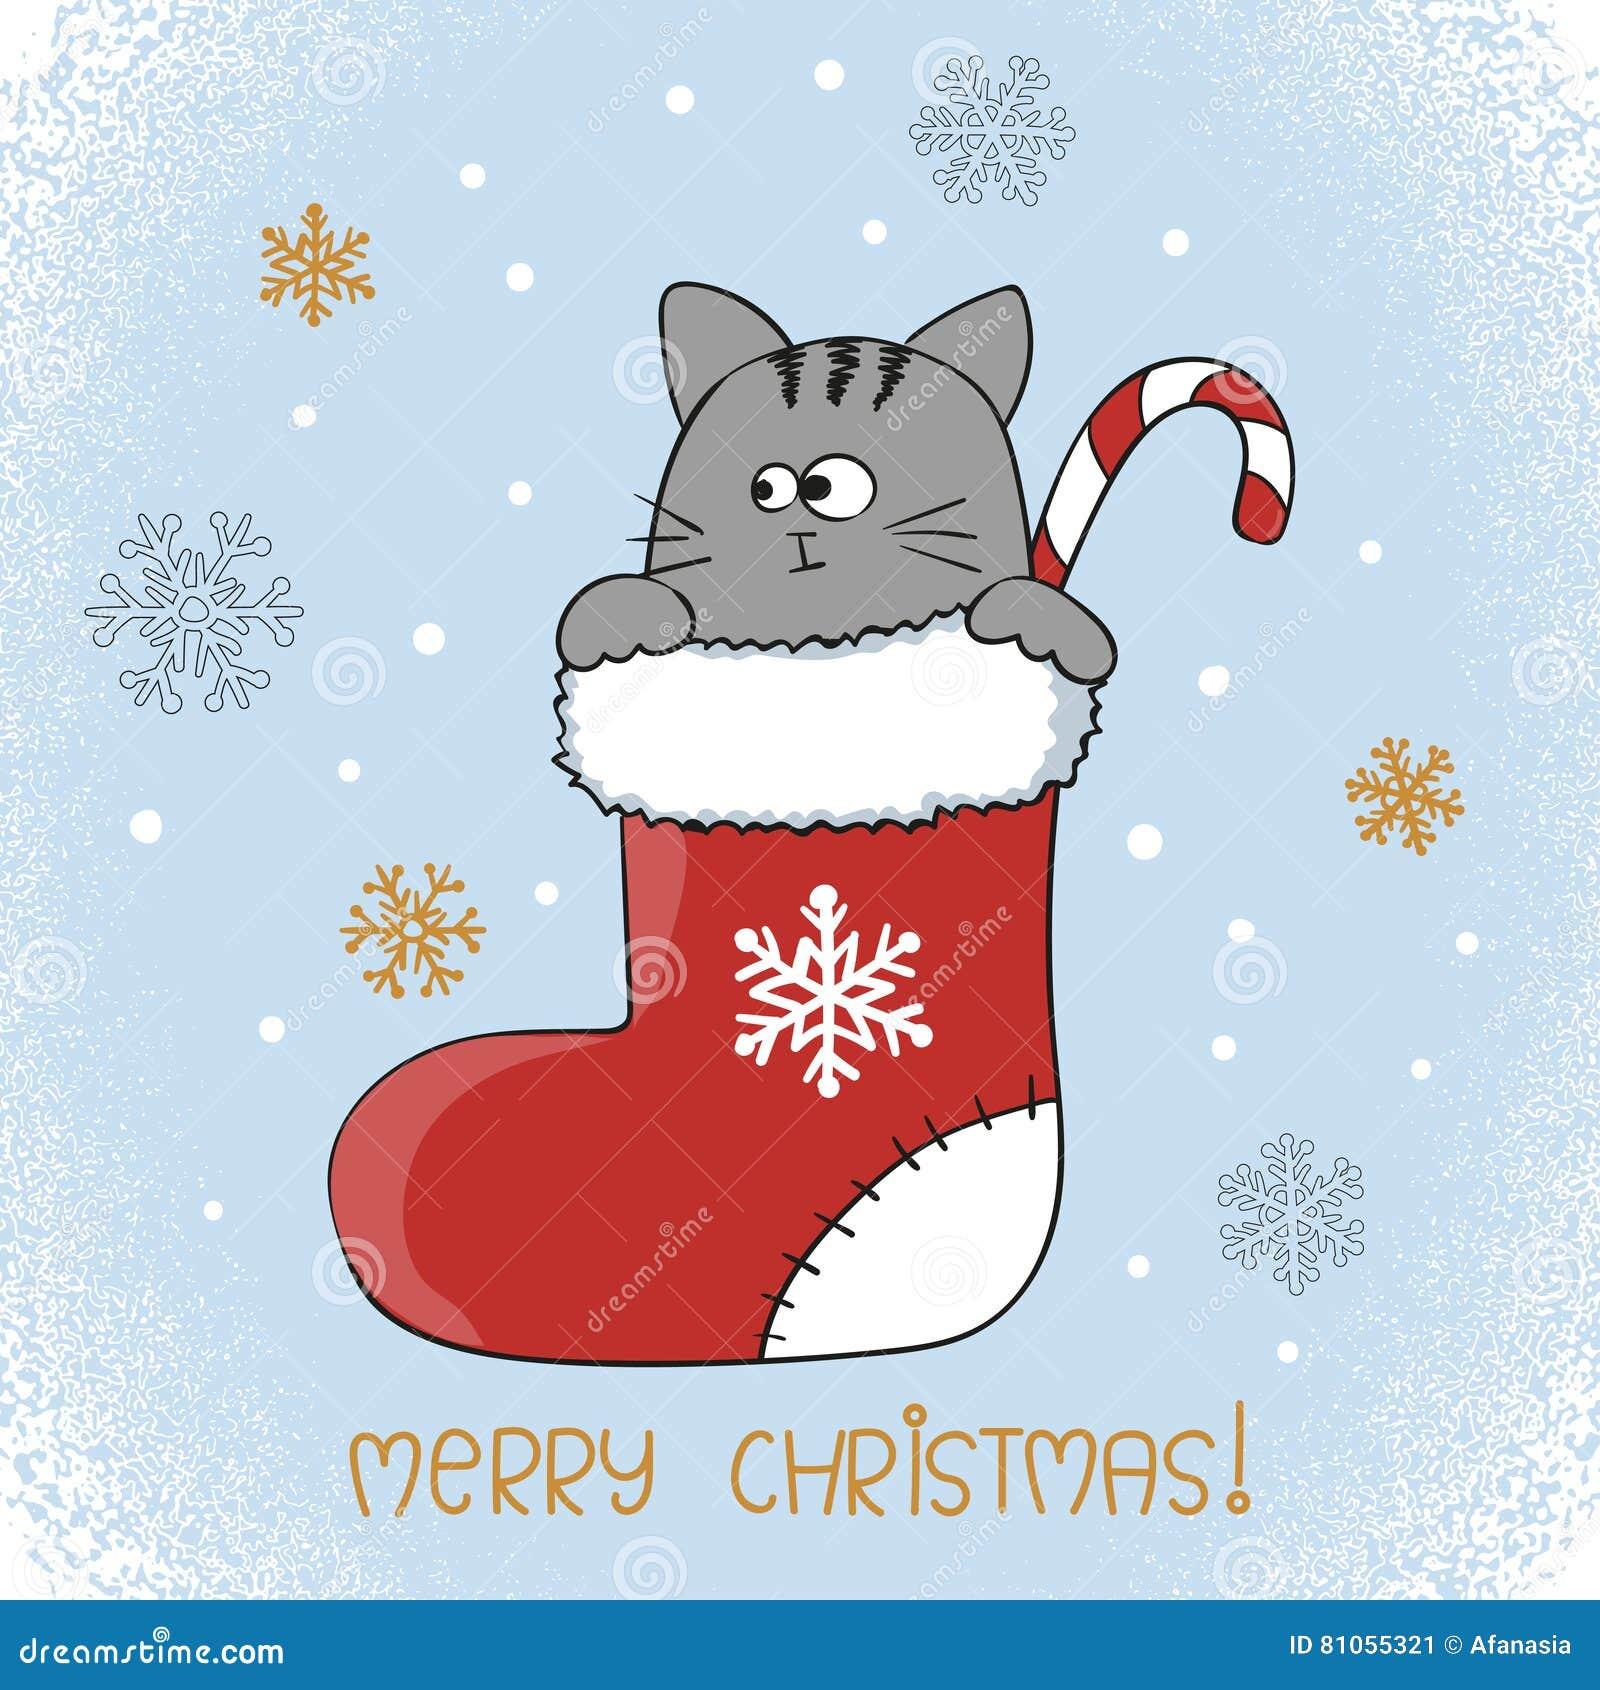 Merry christmas card design cute cat in a christmas stocking merry christmas card design cute cat in a christmas stocking kristyandbryce Image collections